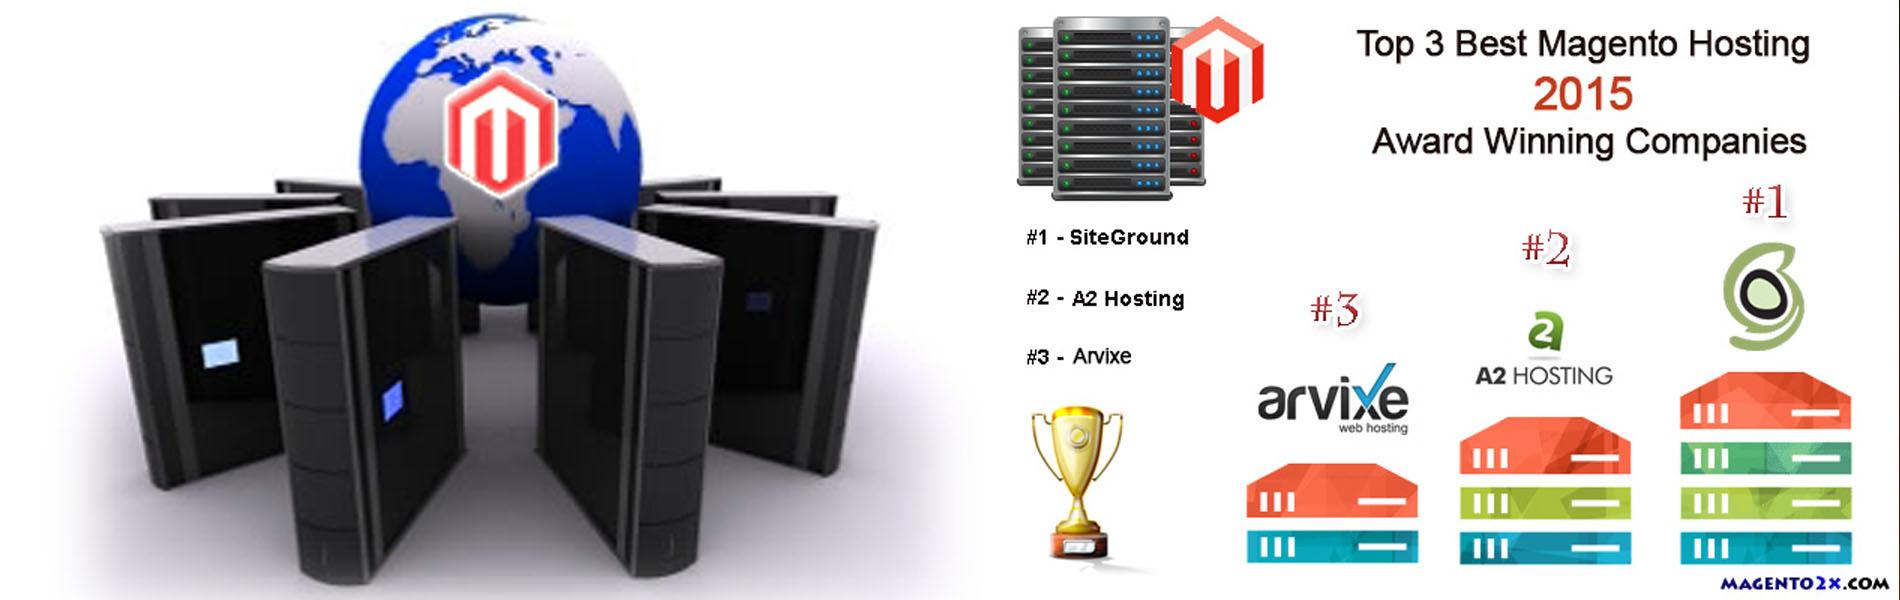 Top 3 Best Magento Hosting 2015 Award Winning Companies